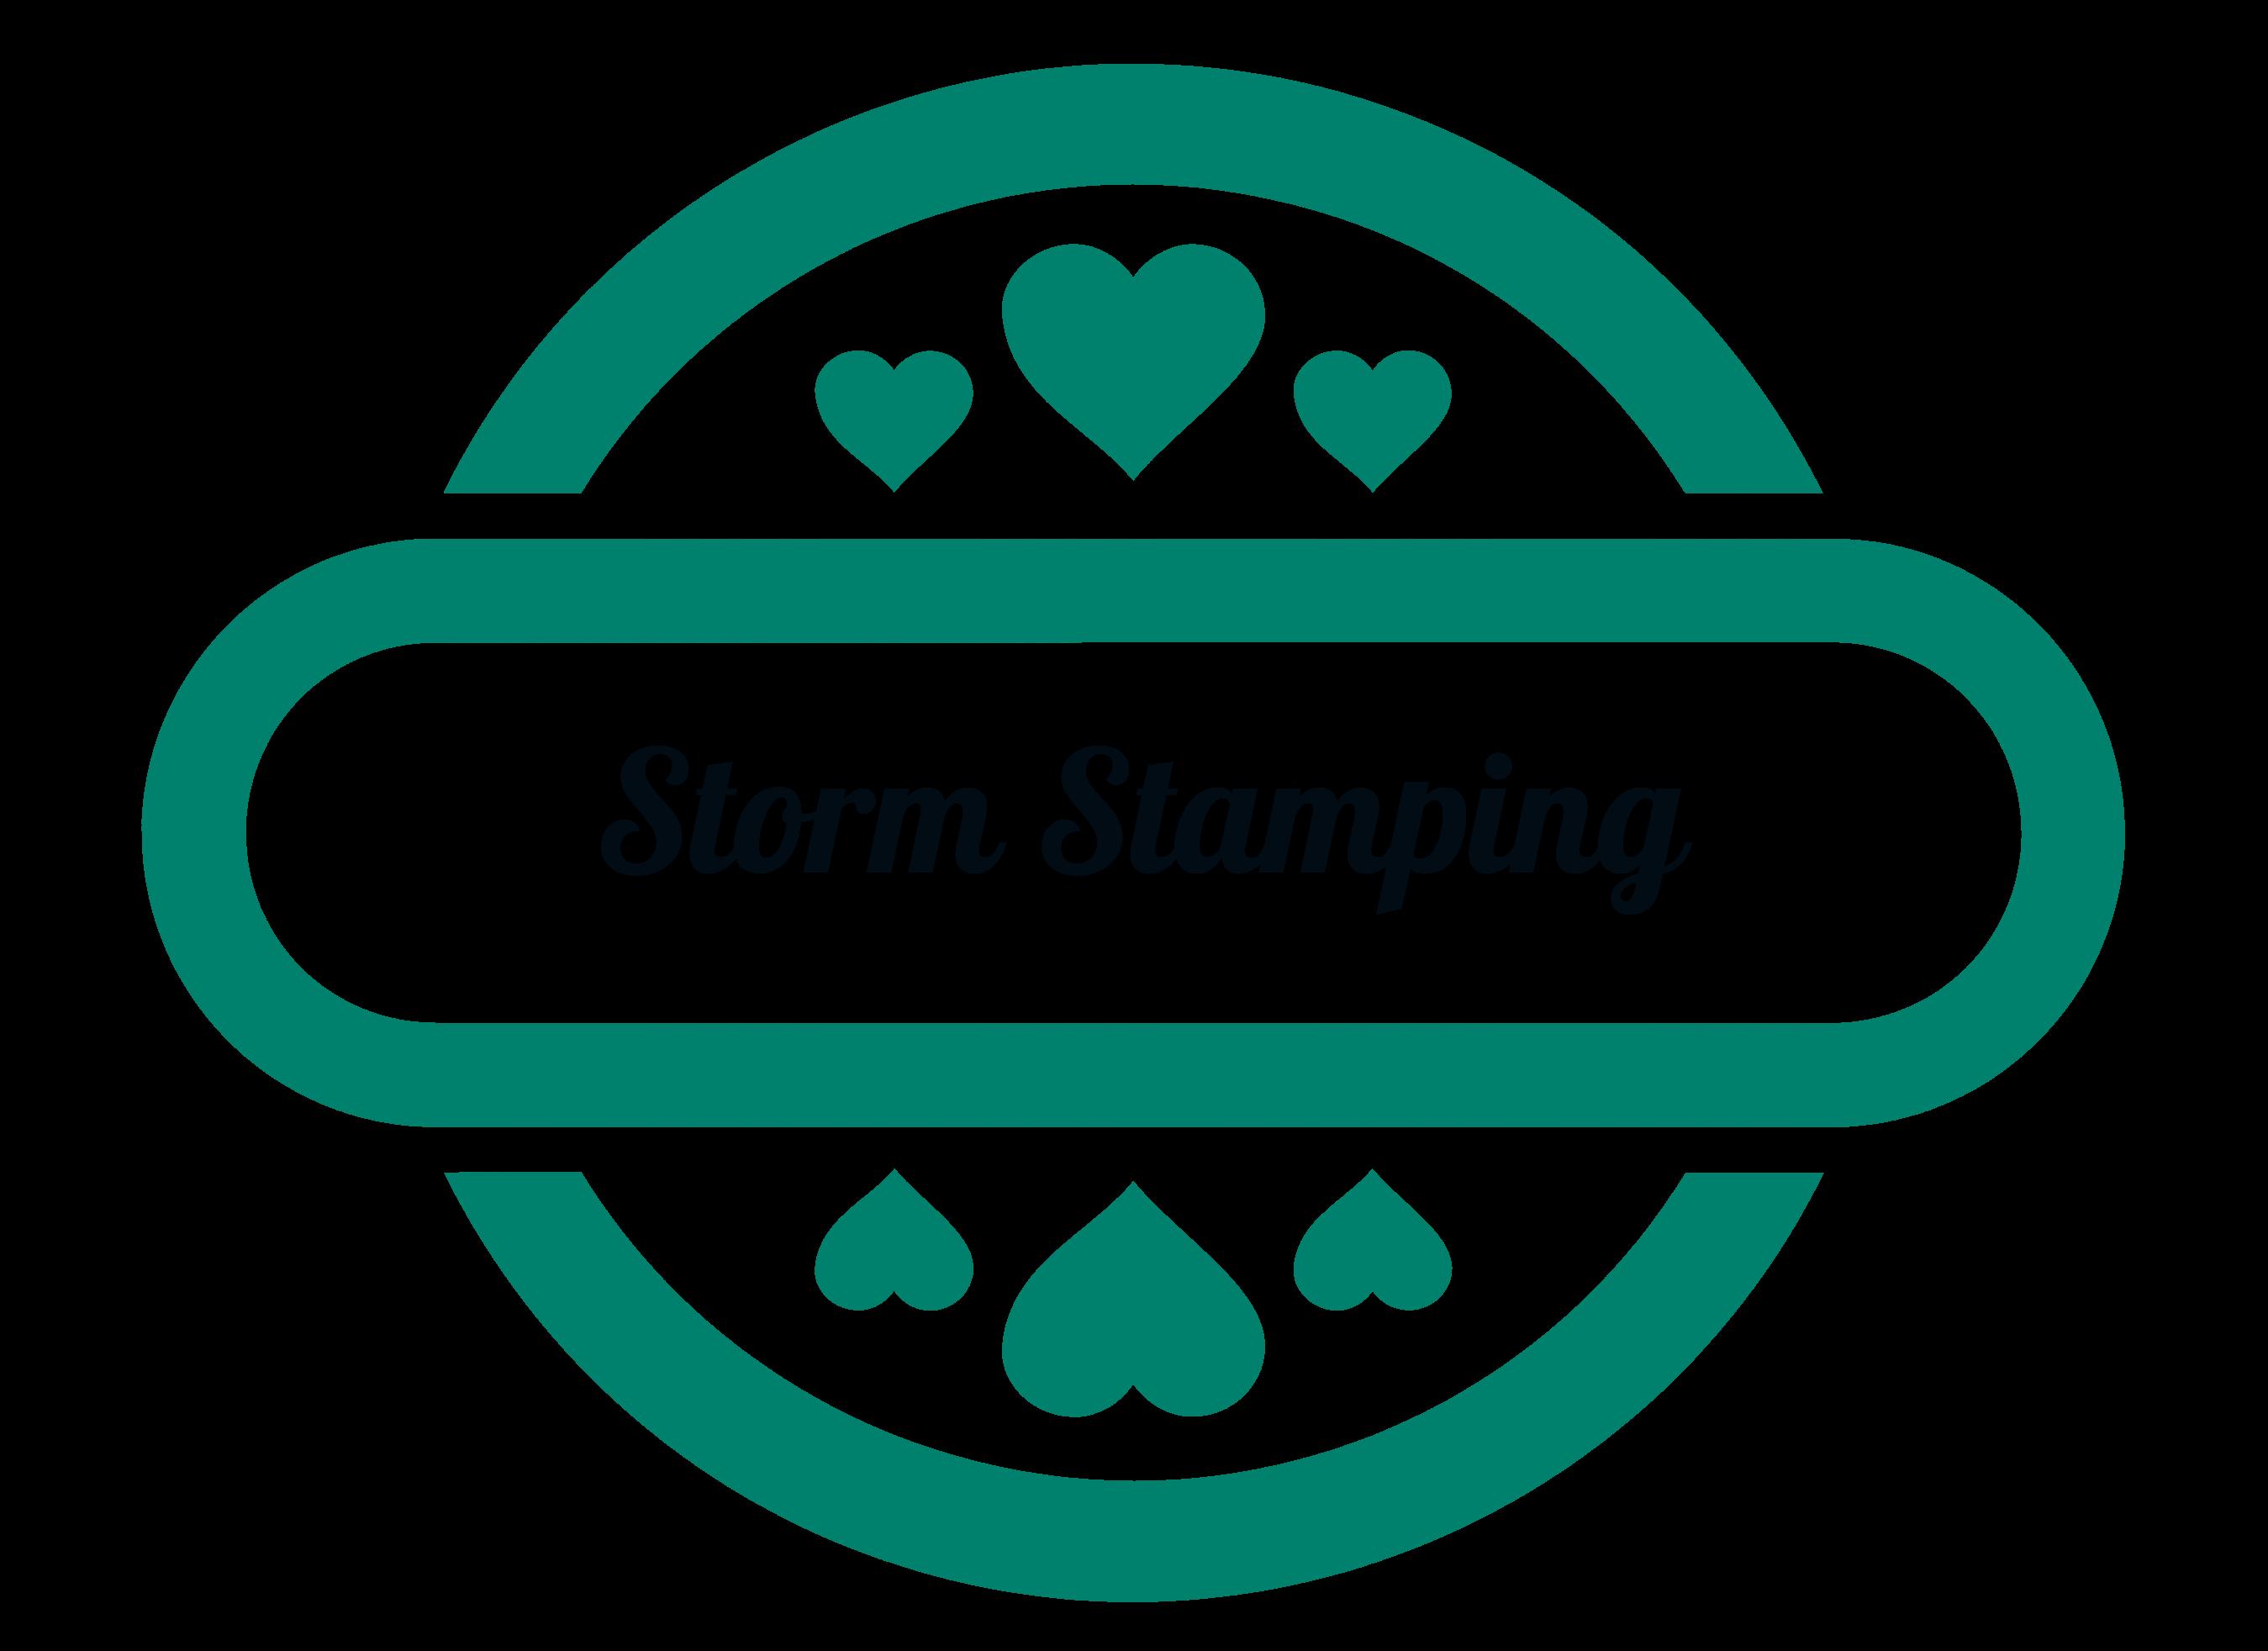 Storm Stamping